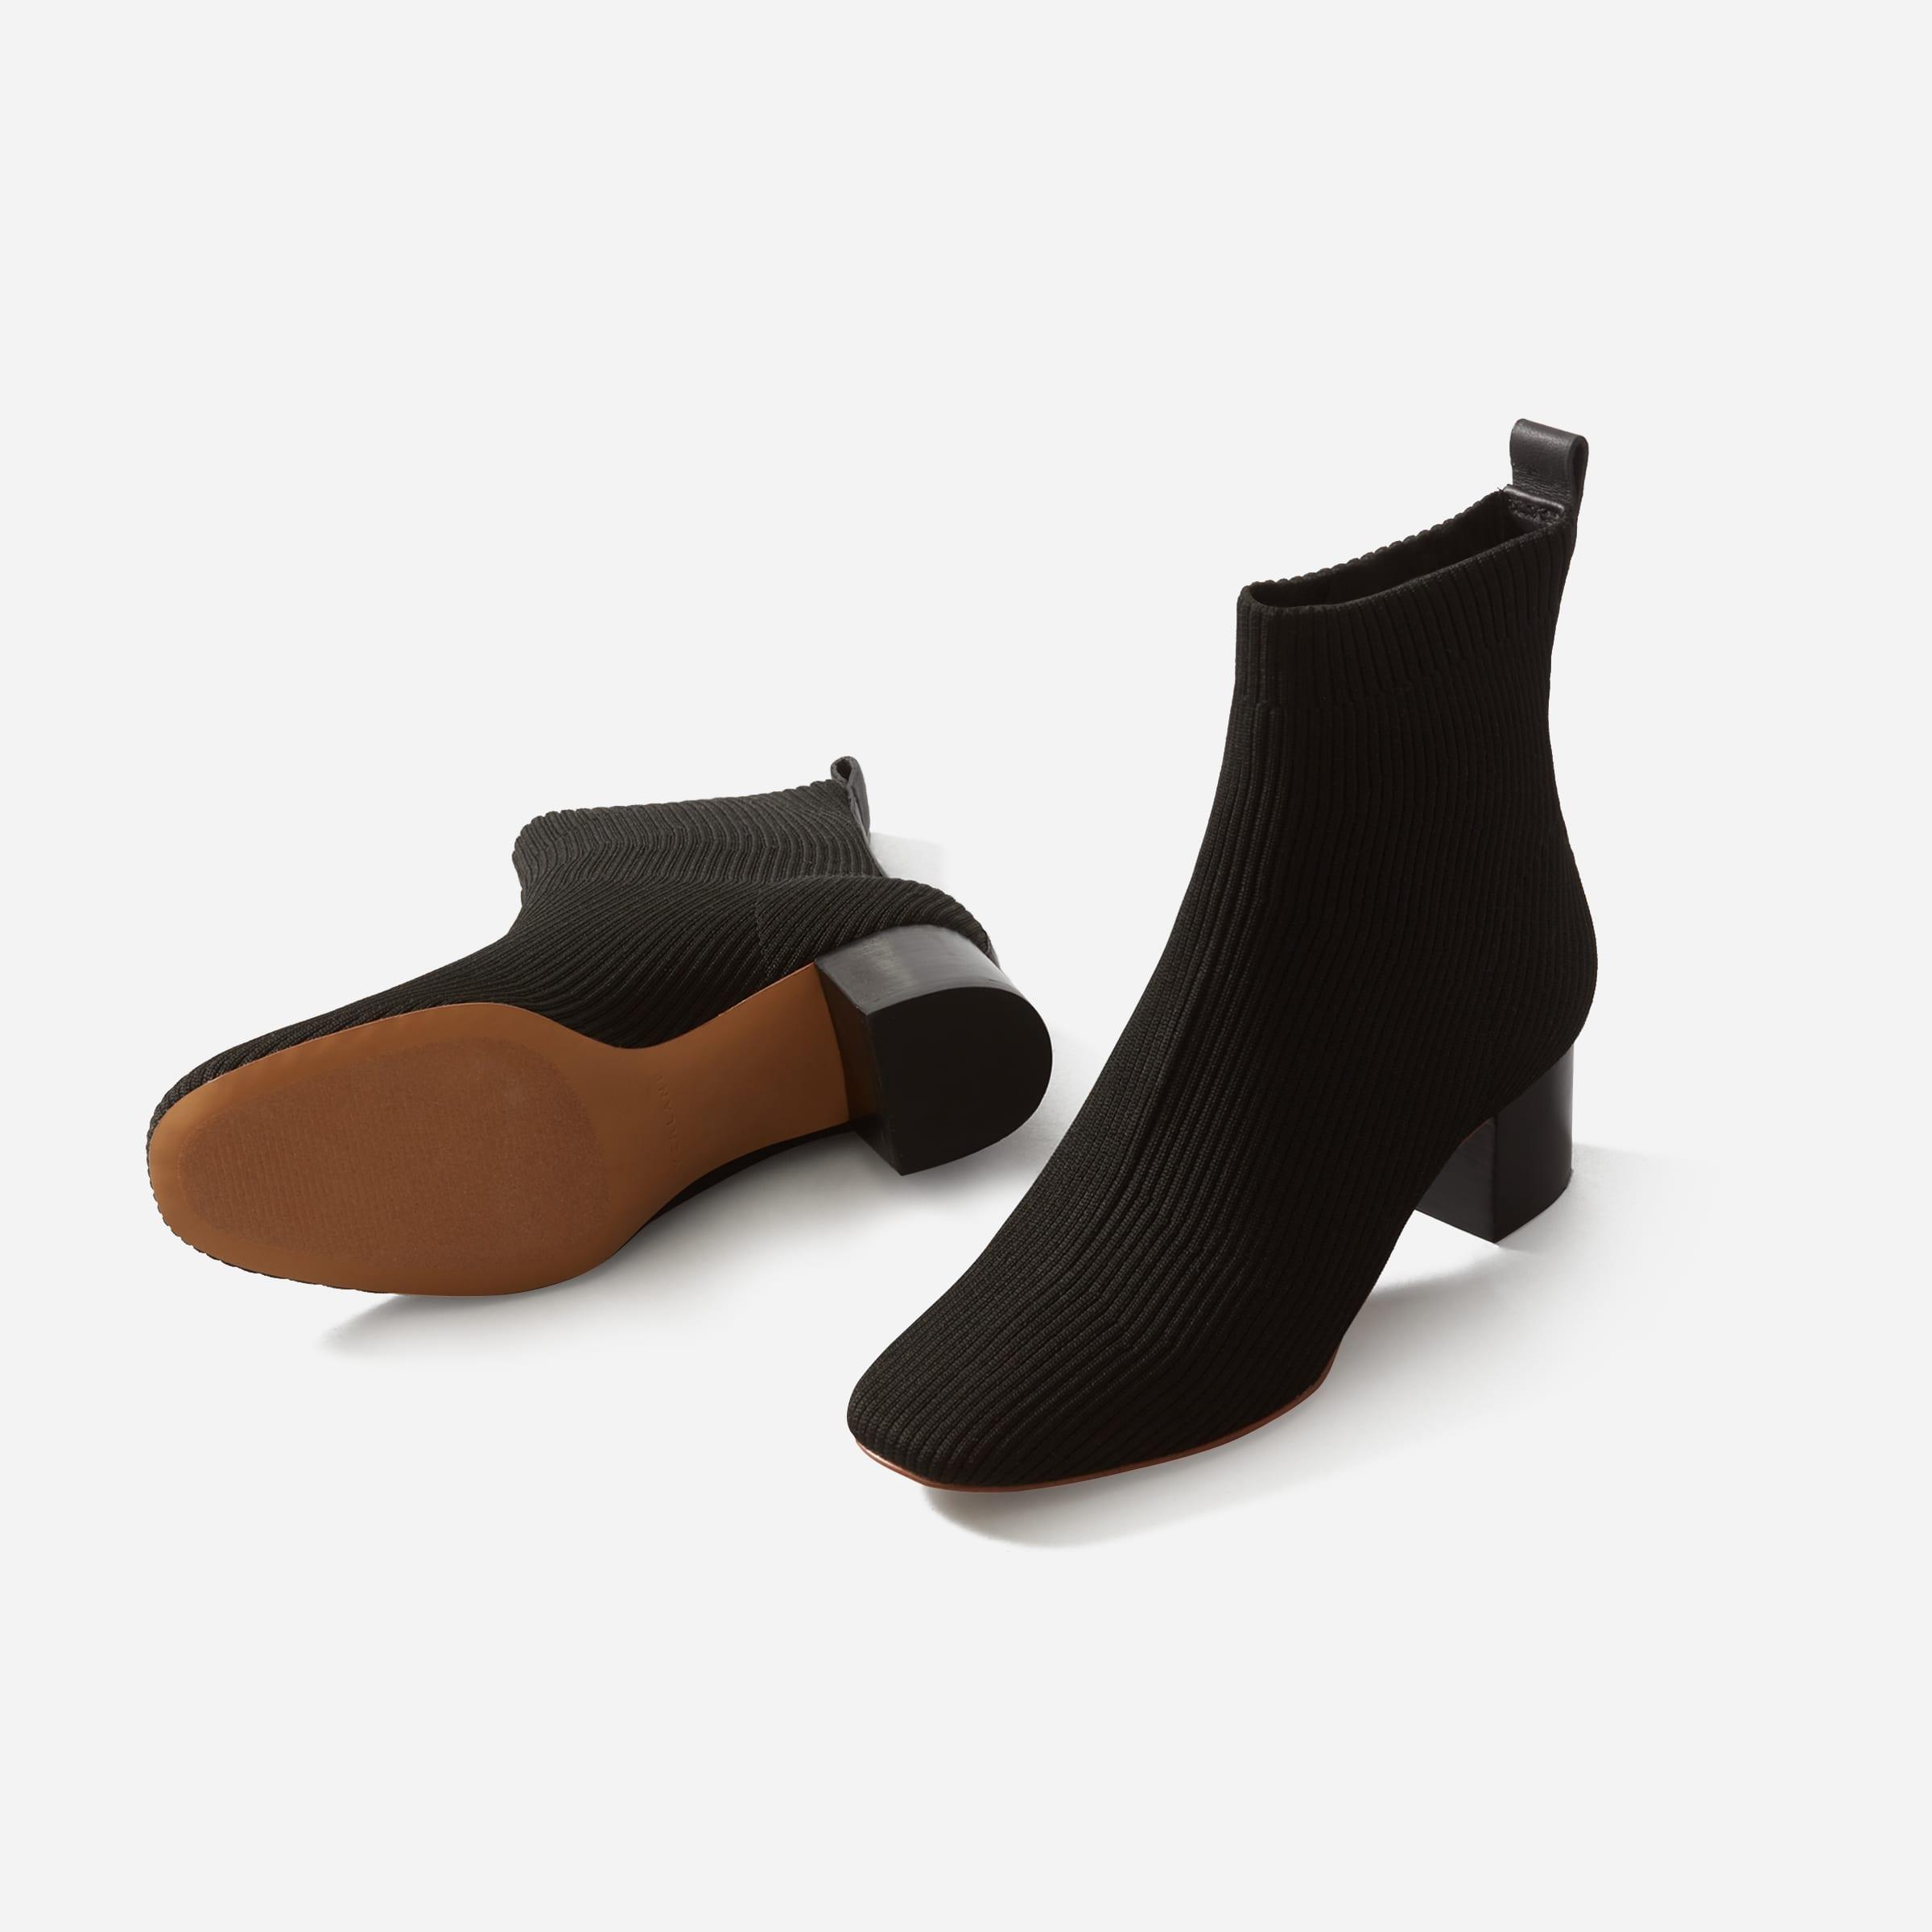 Women's Shoes - Boots, Flats, Heels